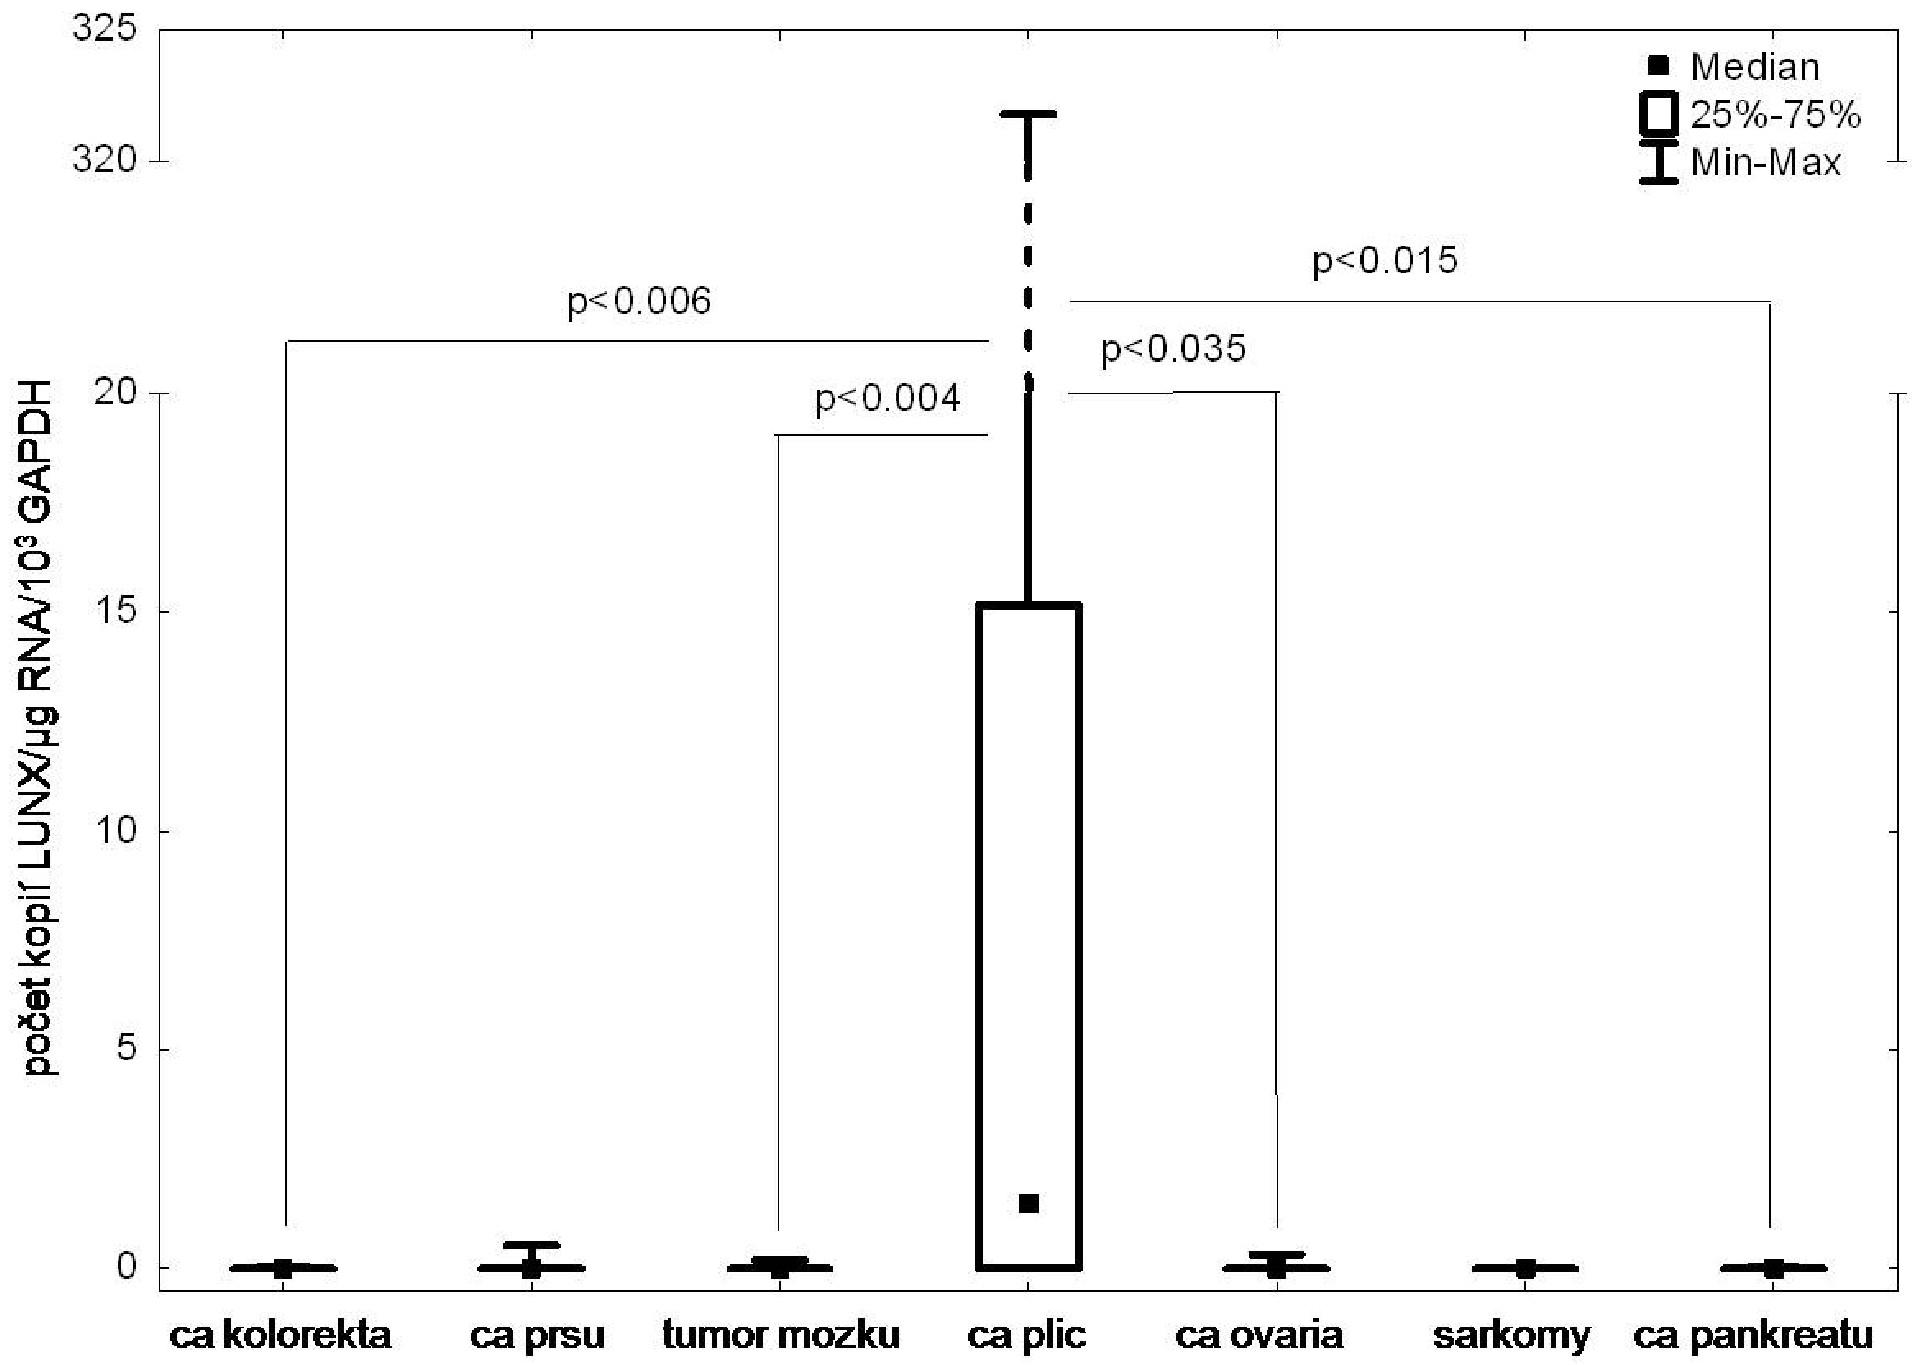 Analýza exprese markeru LUNX v tumorech různého histogenetického původu Fig. 1: The LUNX expression in tumors of different histogenetic origin